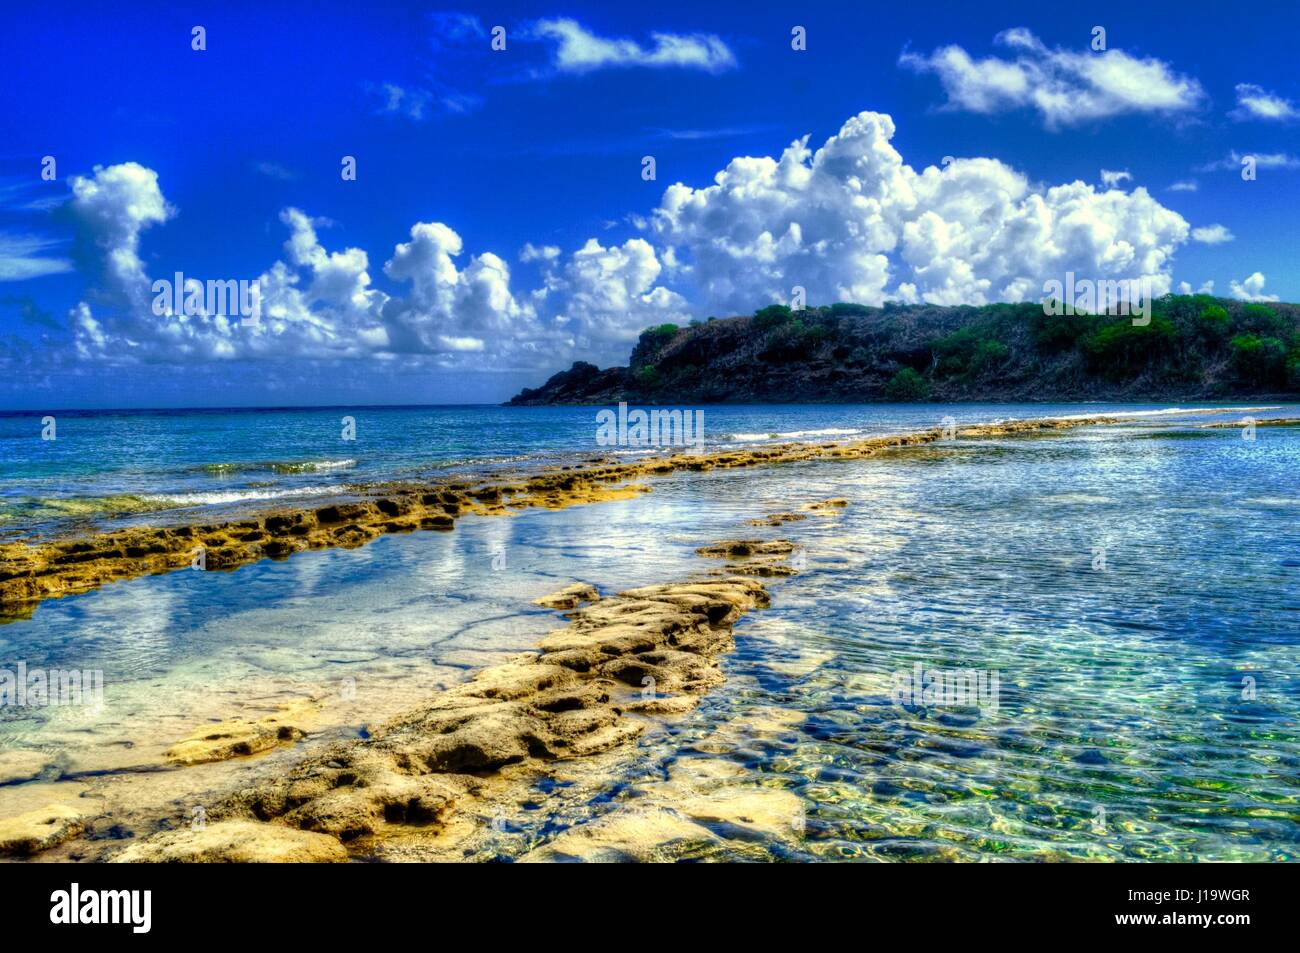 Playa Escondida Stock Photo Alamy